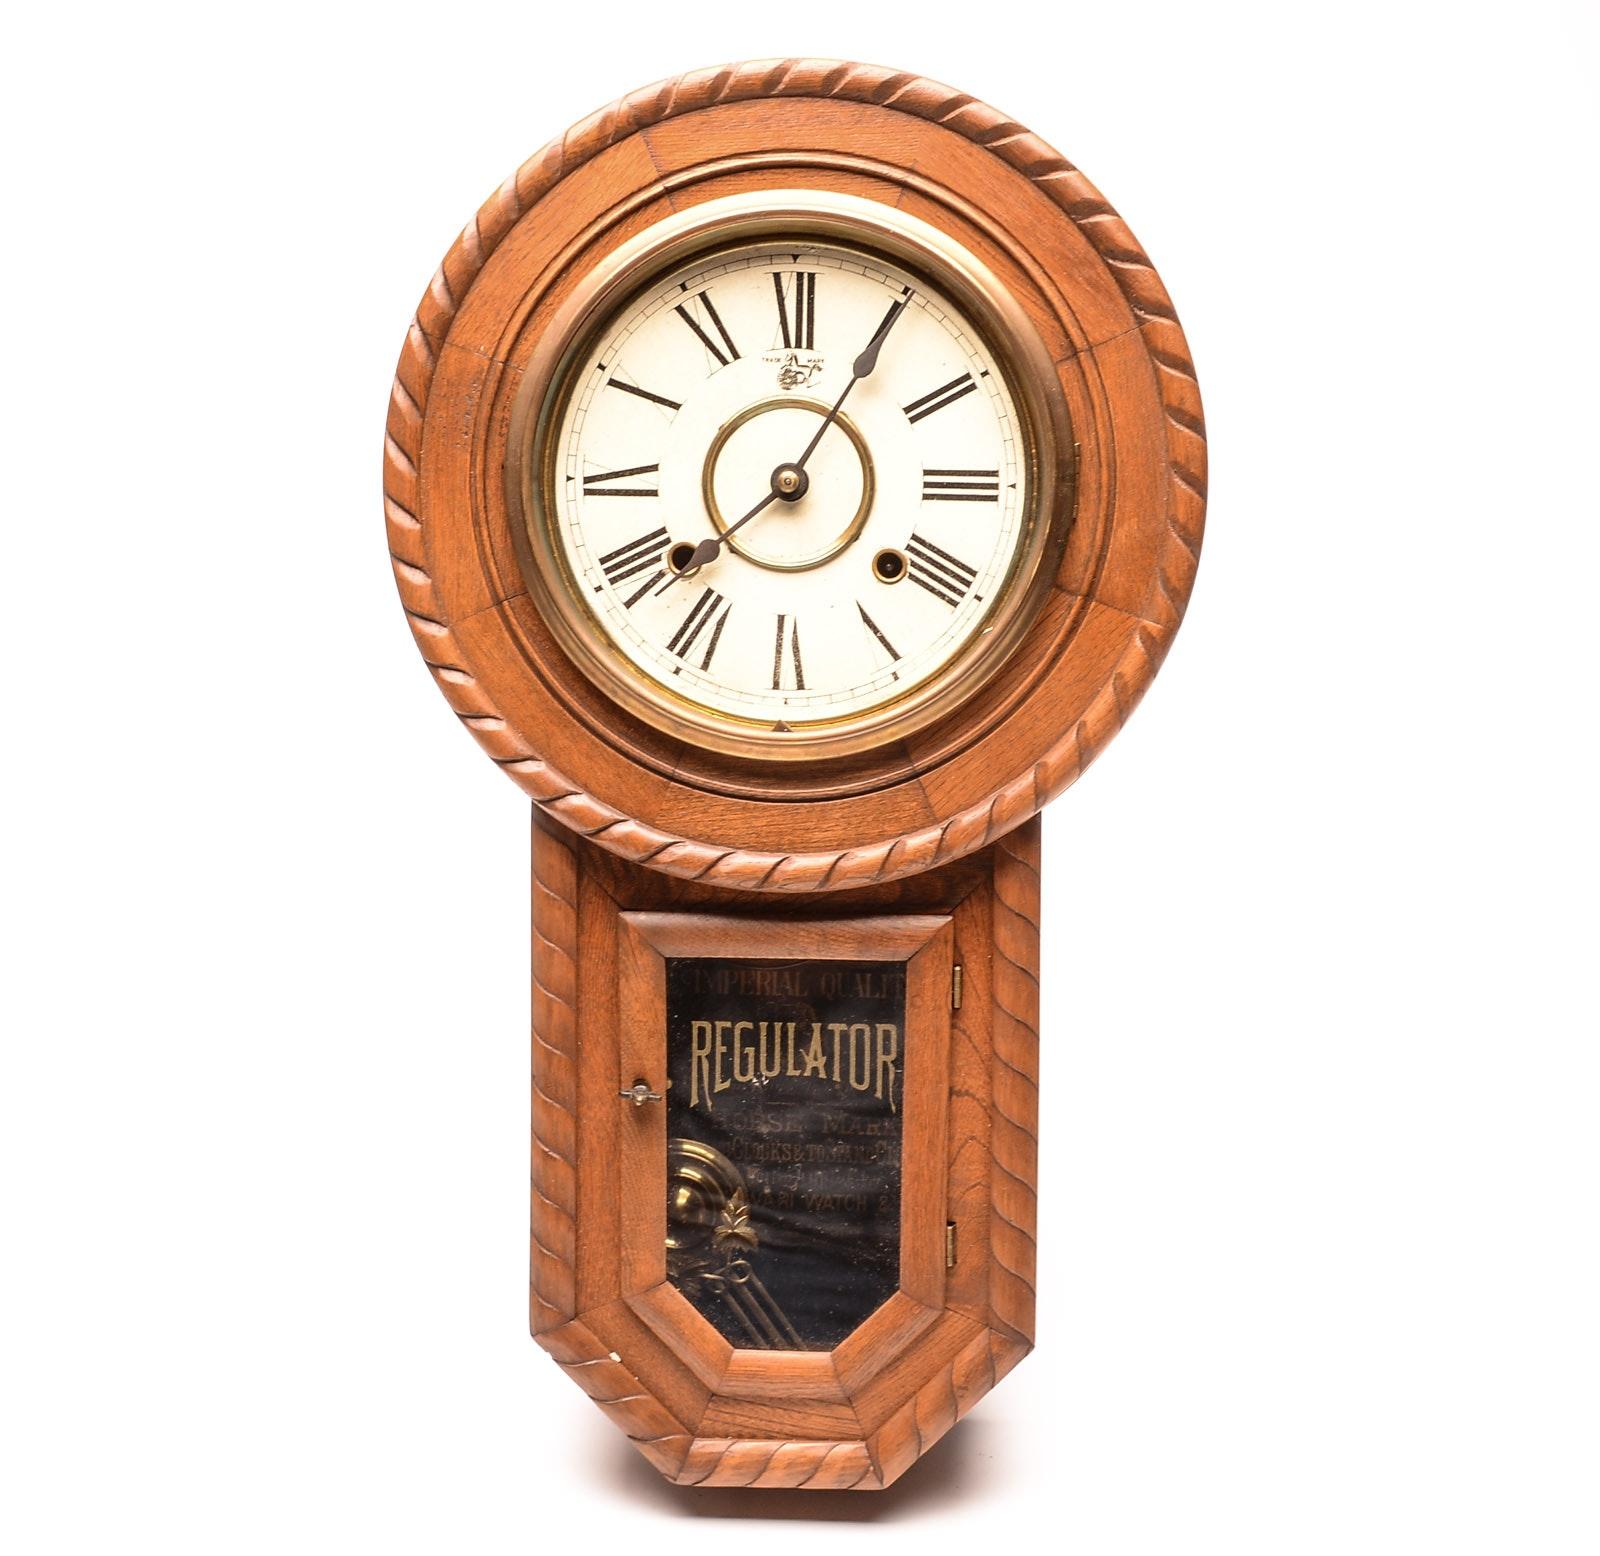 Vintage Japanese Regulator Wall Clock by the Owari Clock Co.